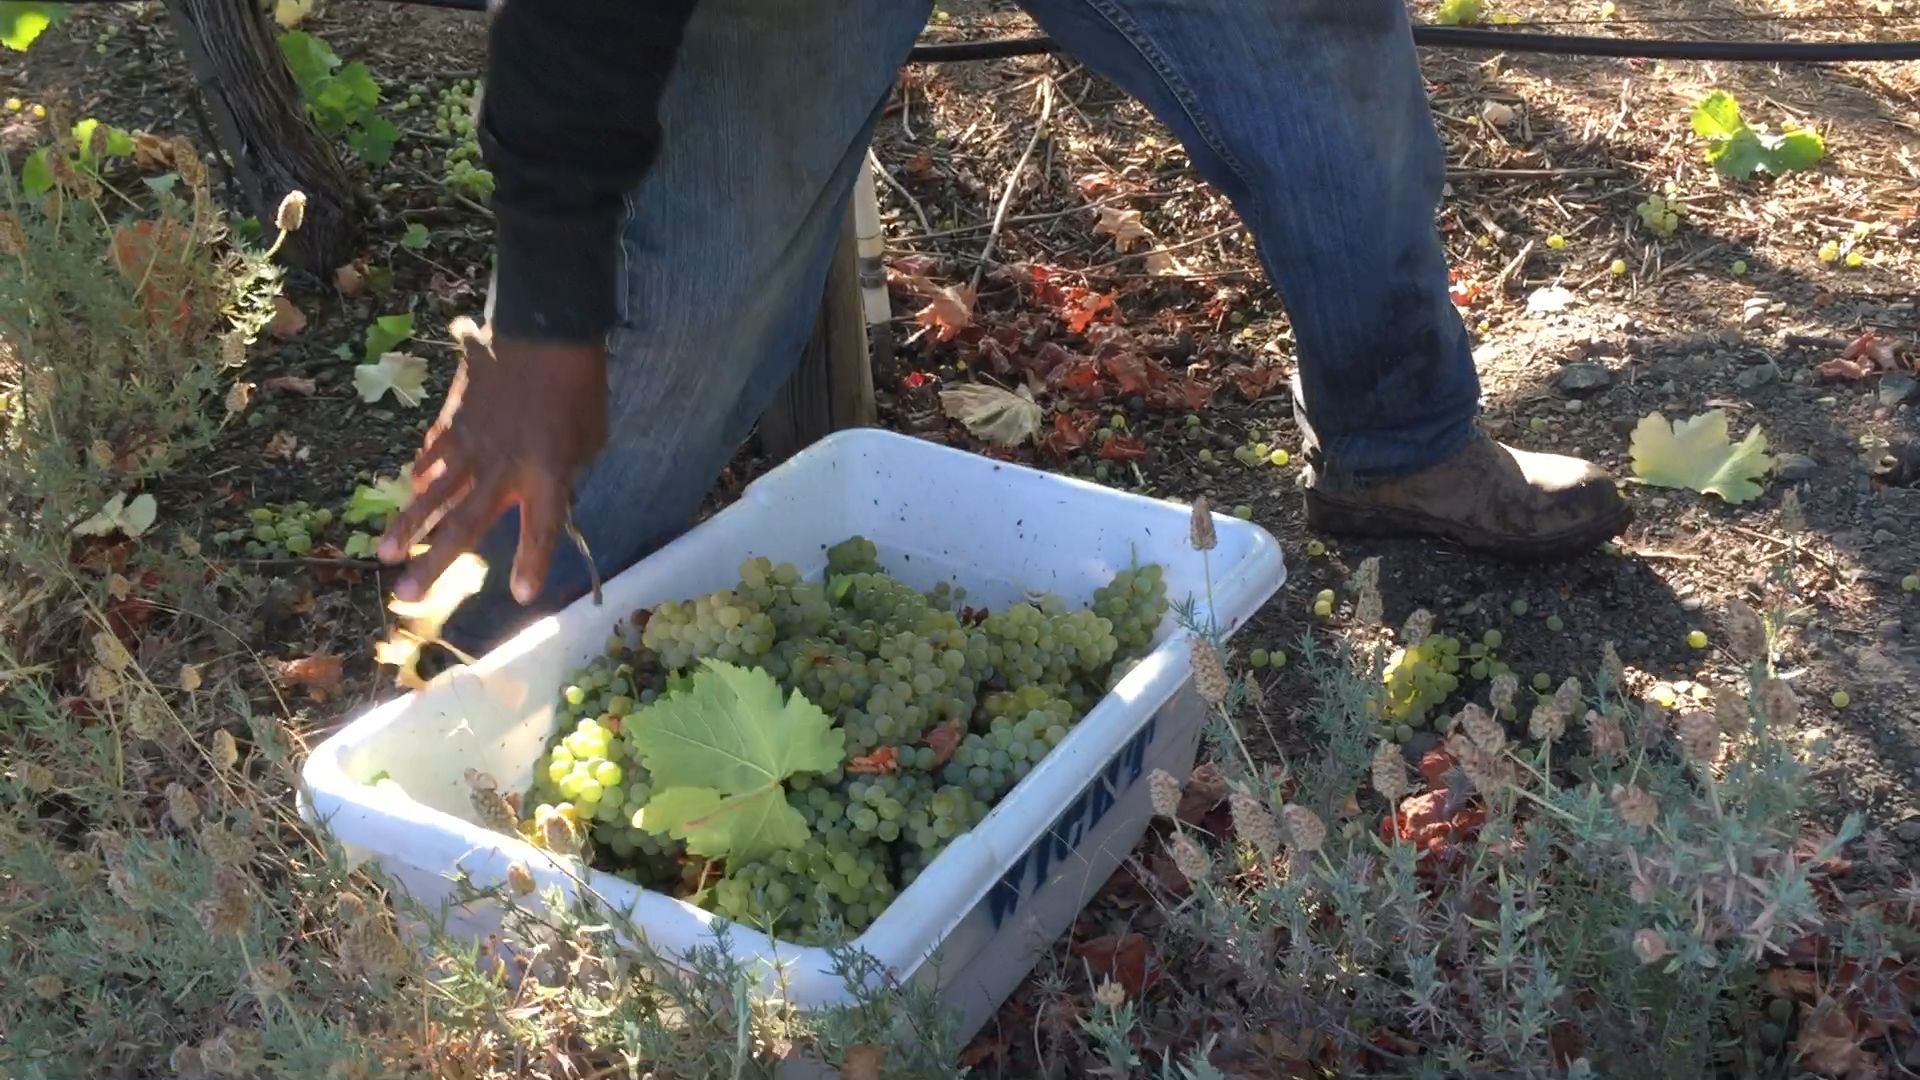 Just-harvested Sauvignon Blanc grapes